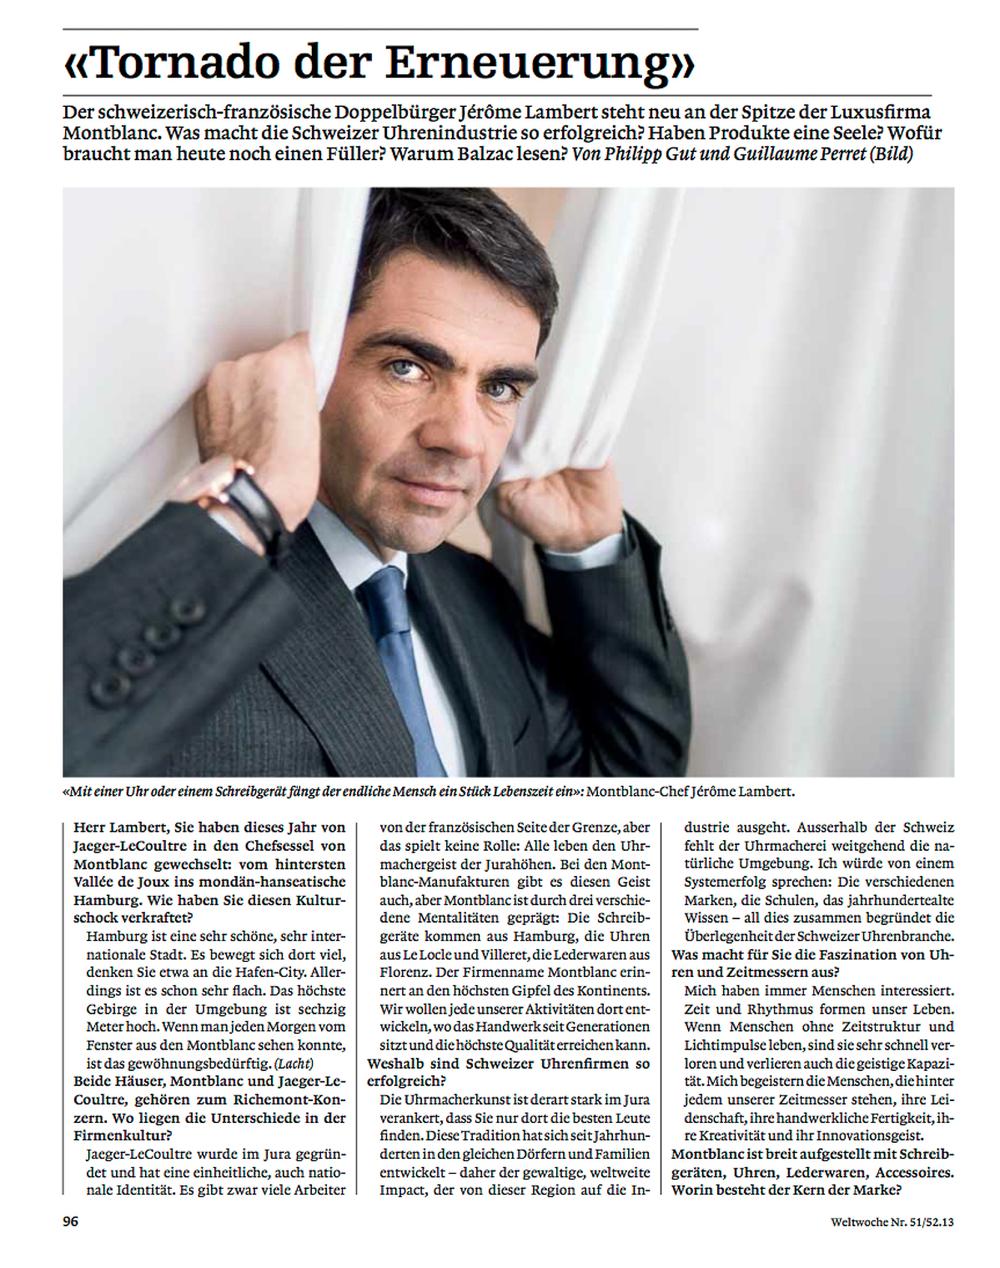 Jerome Lambert (CEO Montblanc) / Die Weltwoche